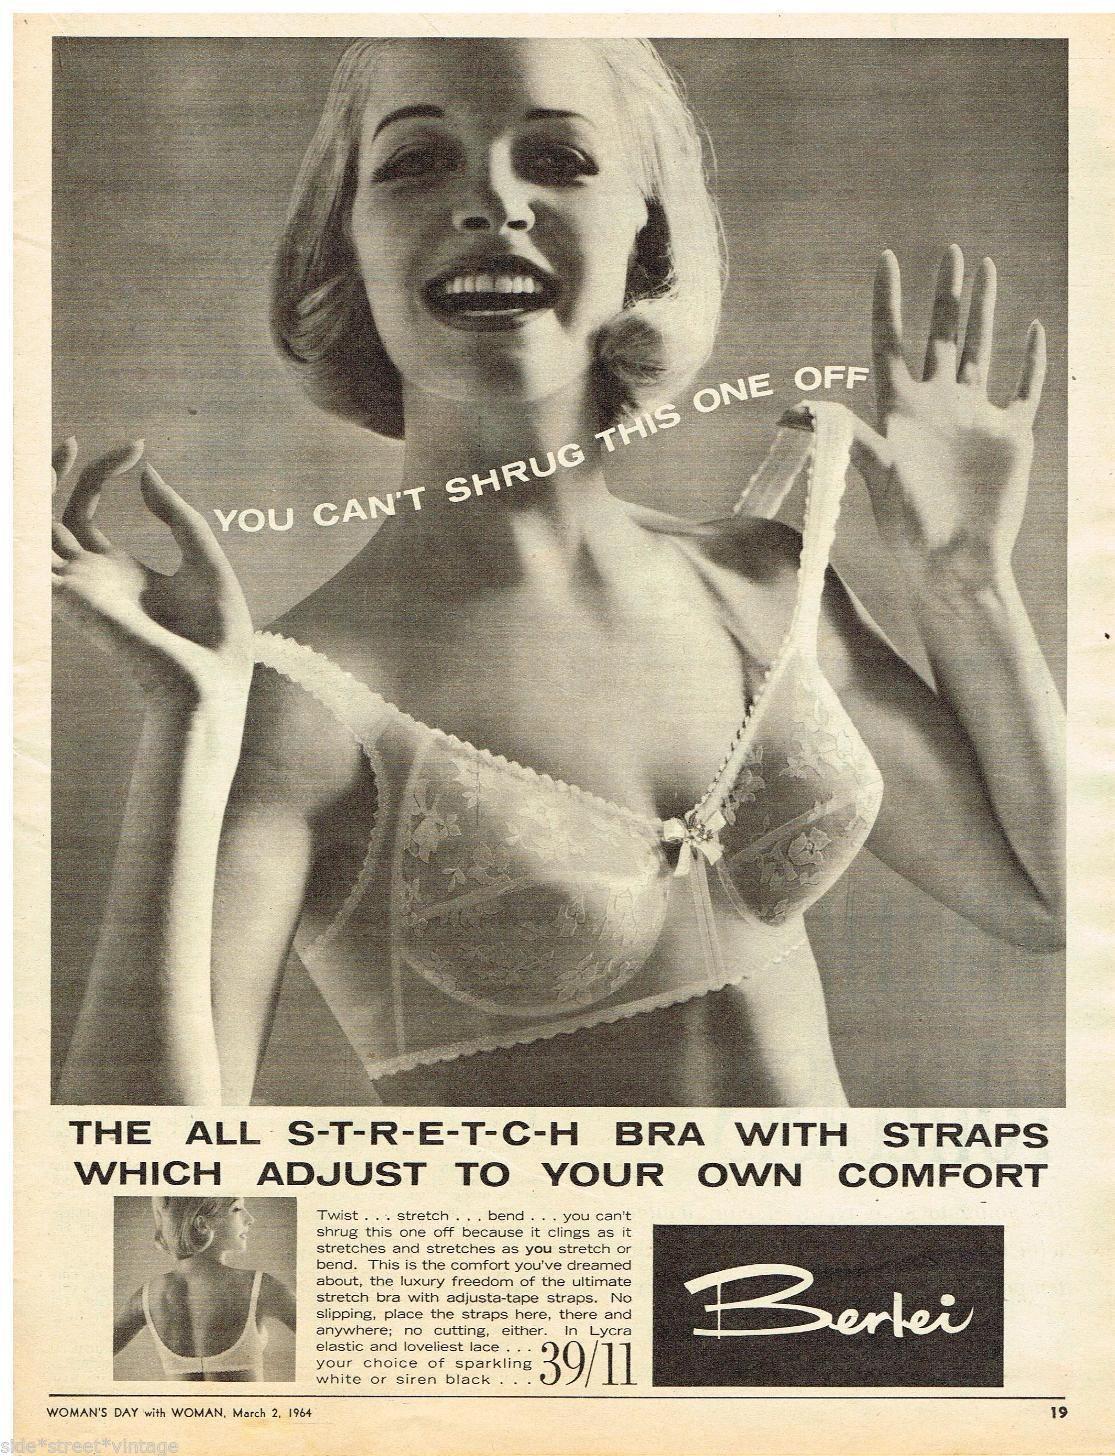 ee0b0c0b49 Stretch bra straps in the 1960s